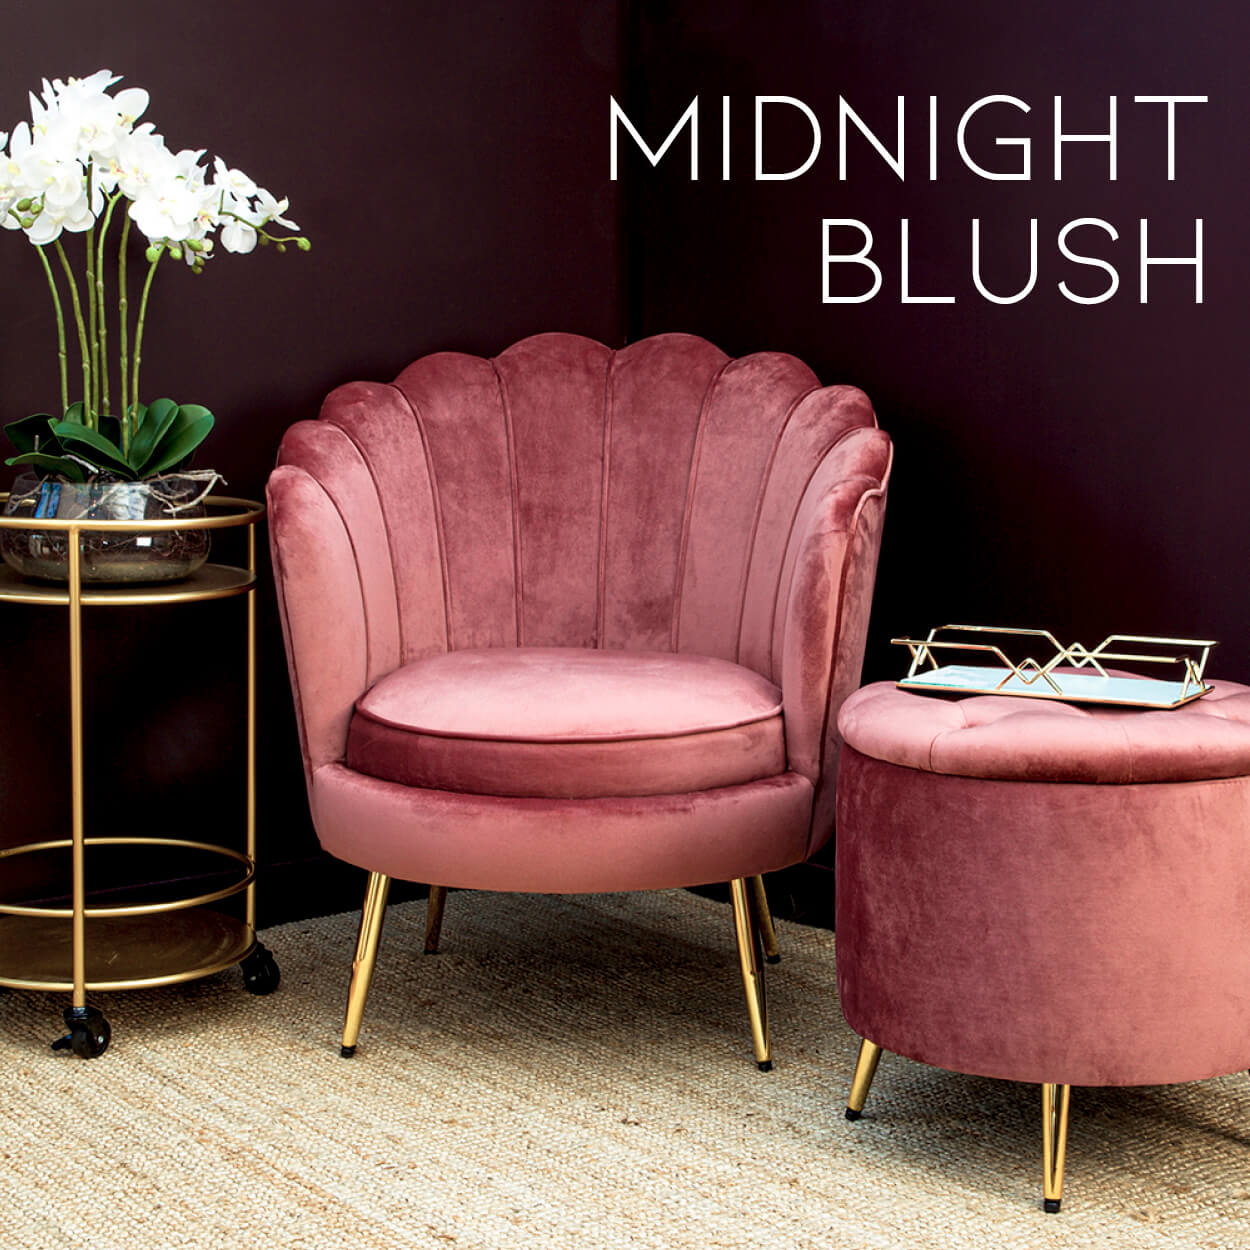 Midnight Blush at Madison & Mayfair